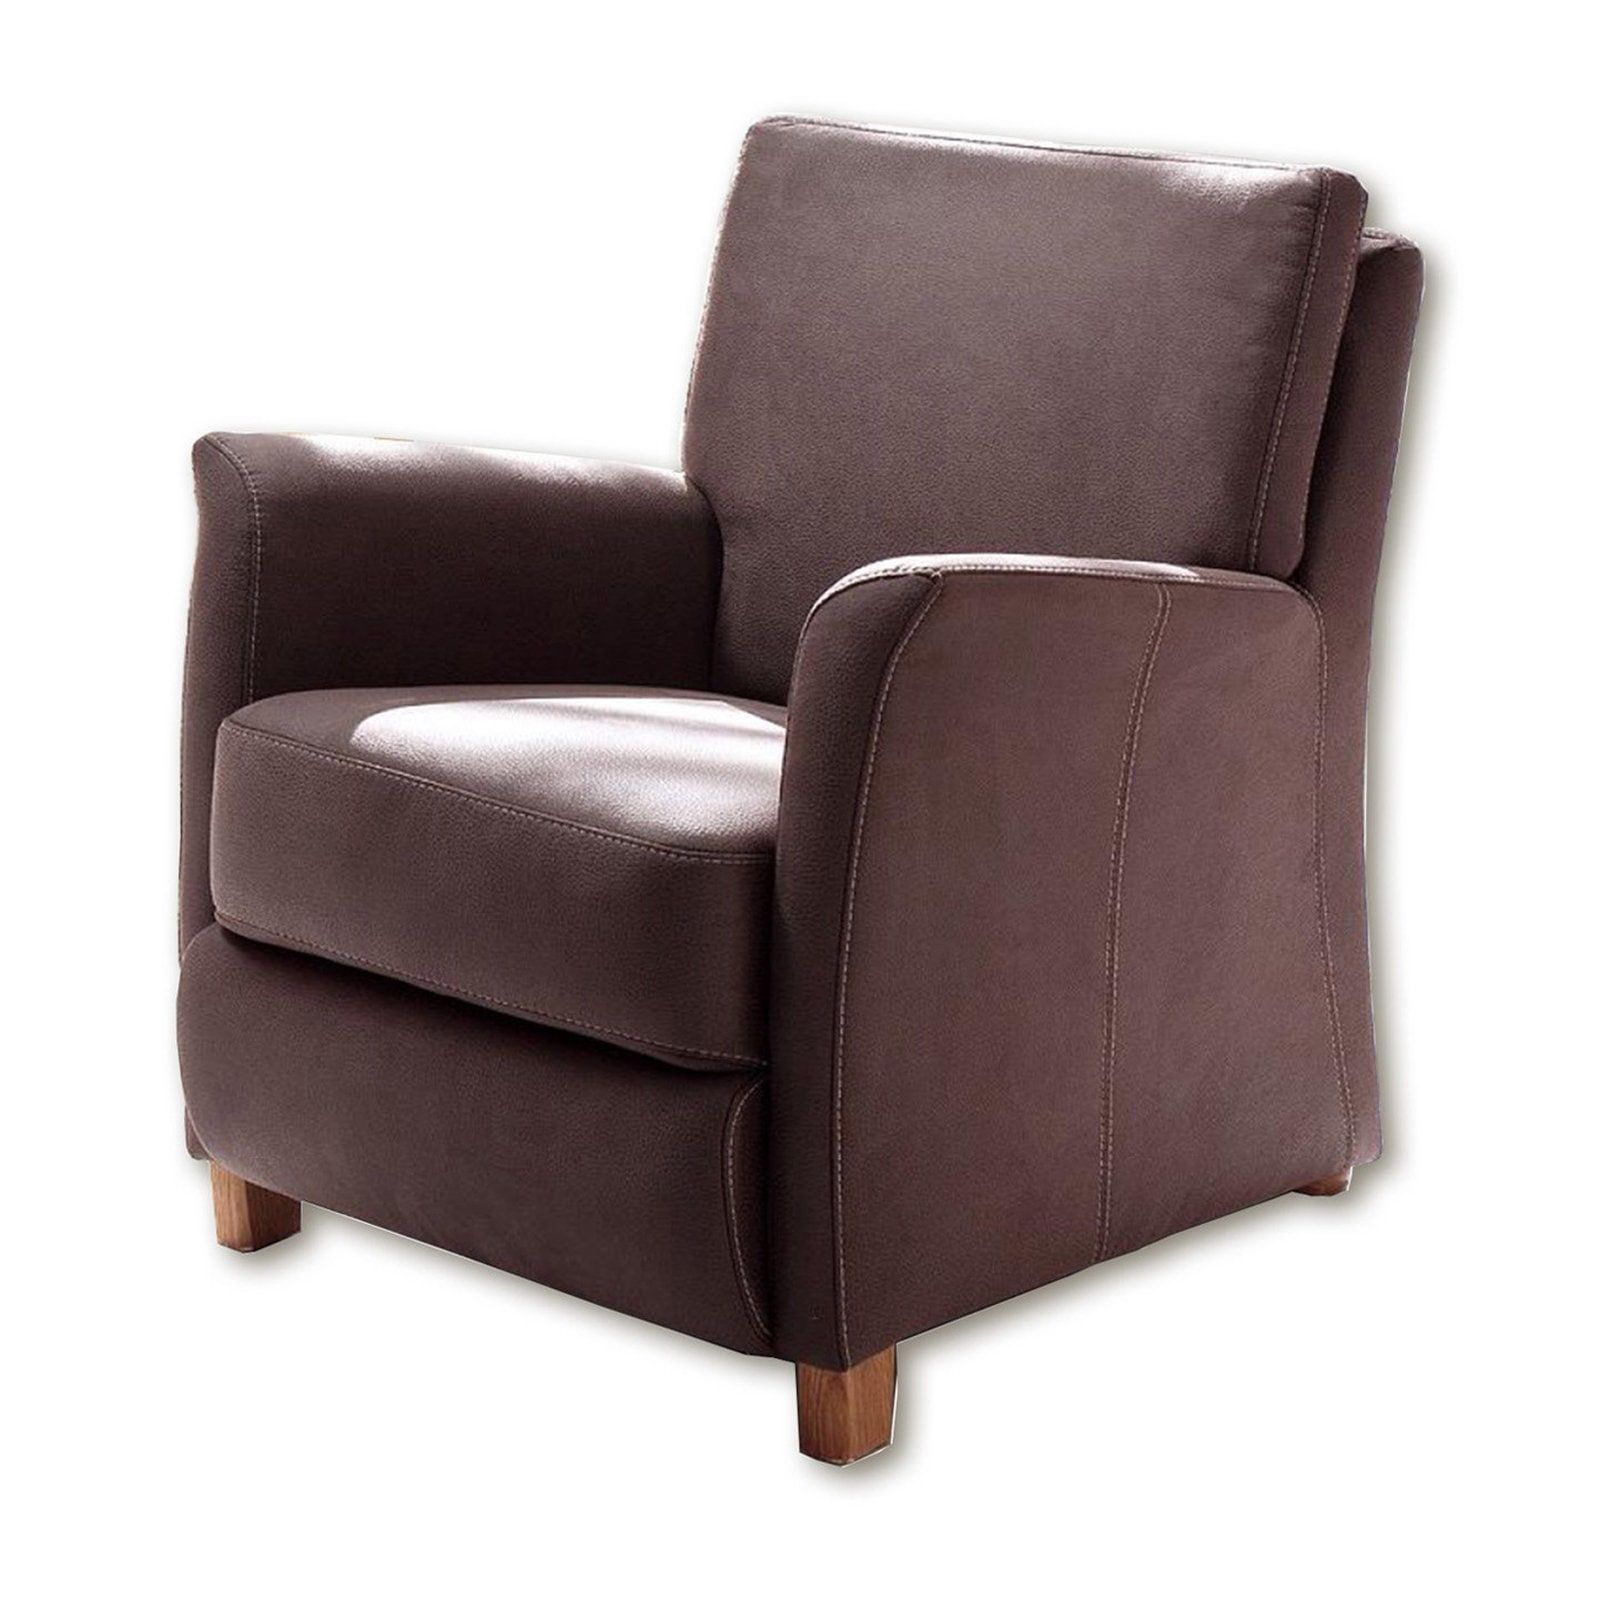 Full Size of Kinosessel 2er Microfaser Sessel Mit Relaxfunktion Sofa Lakos Polstermbel In Braun Grau Wohnzimmer Kinosessel 2er Microfaser